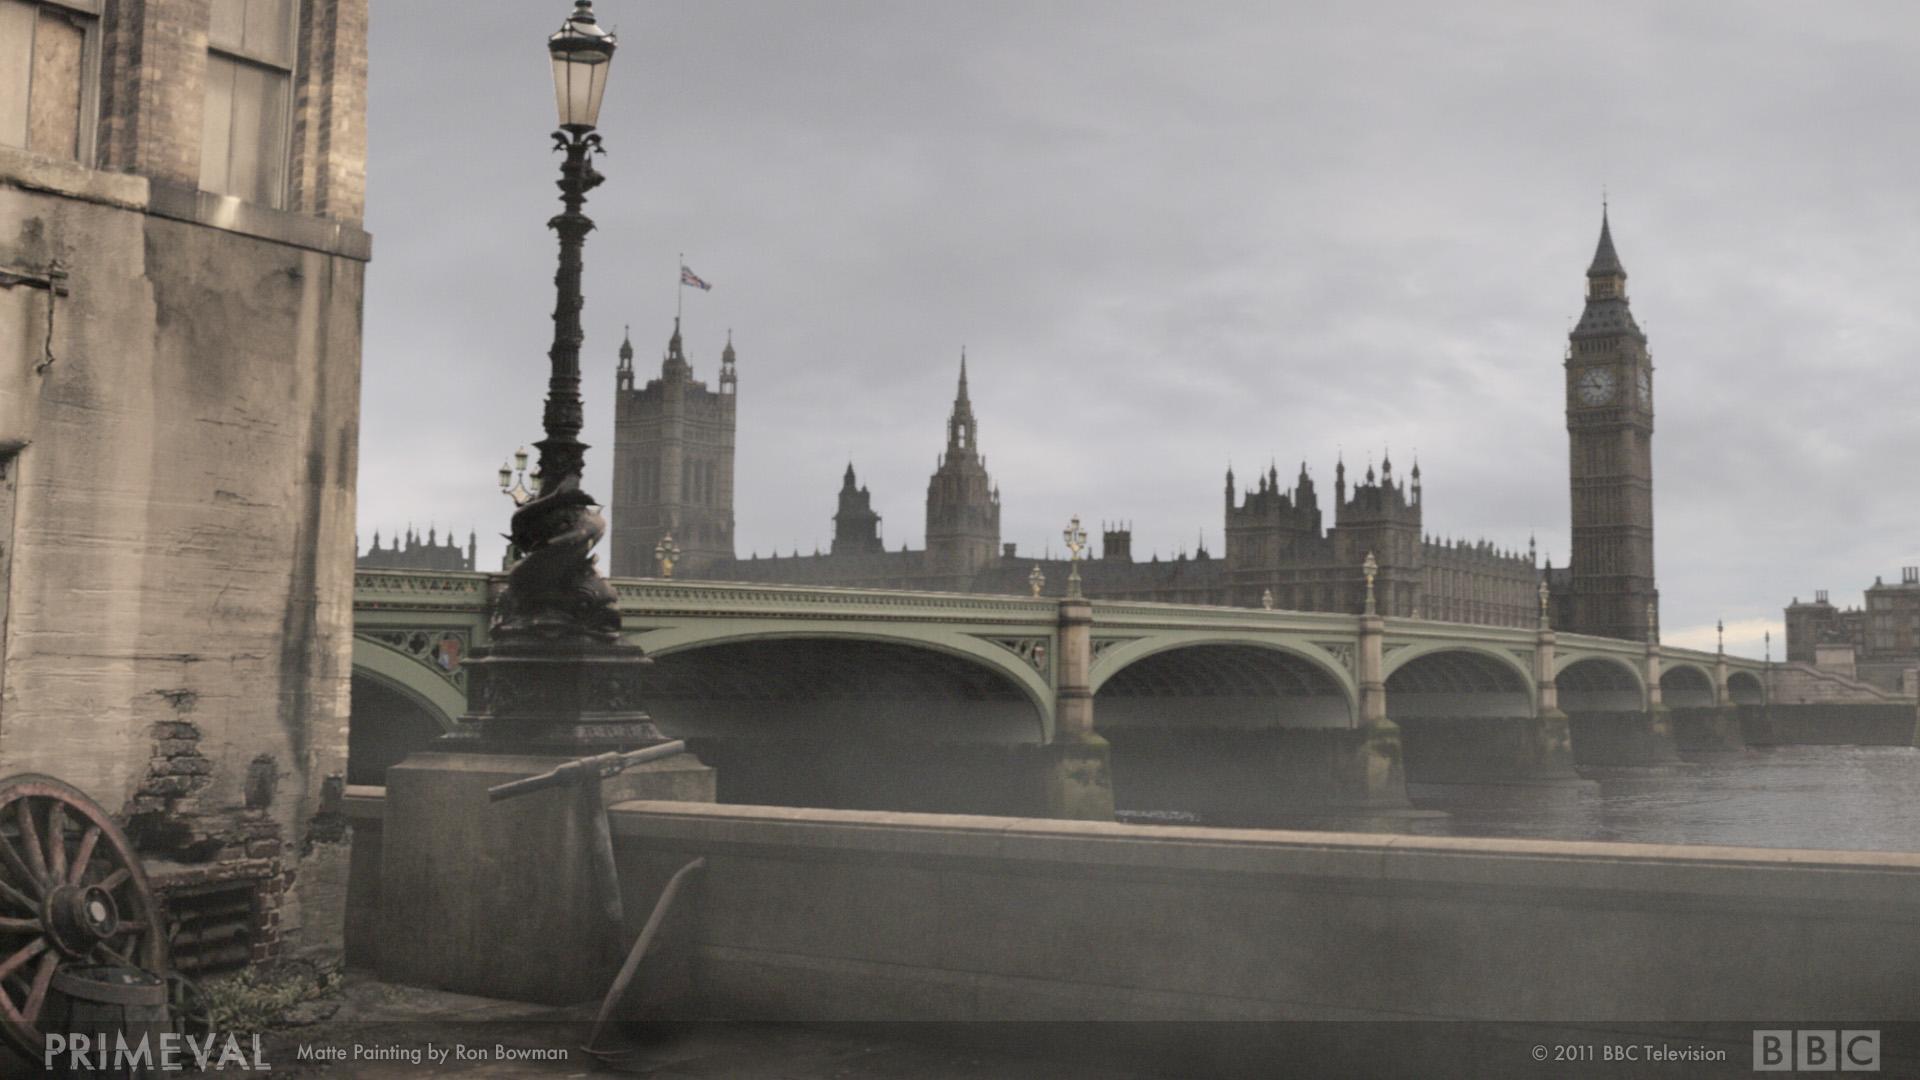 primeval_parliament.jpg